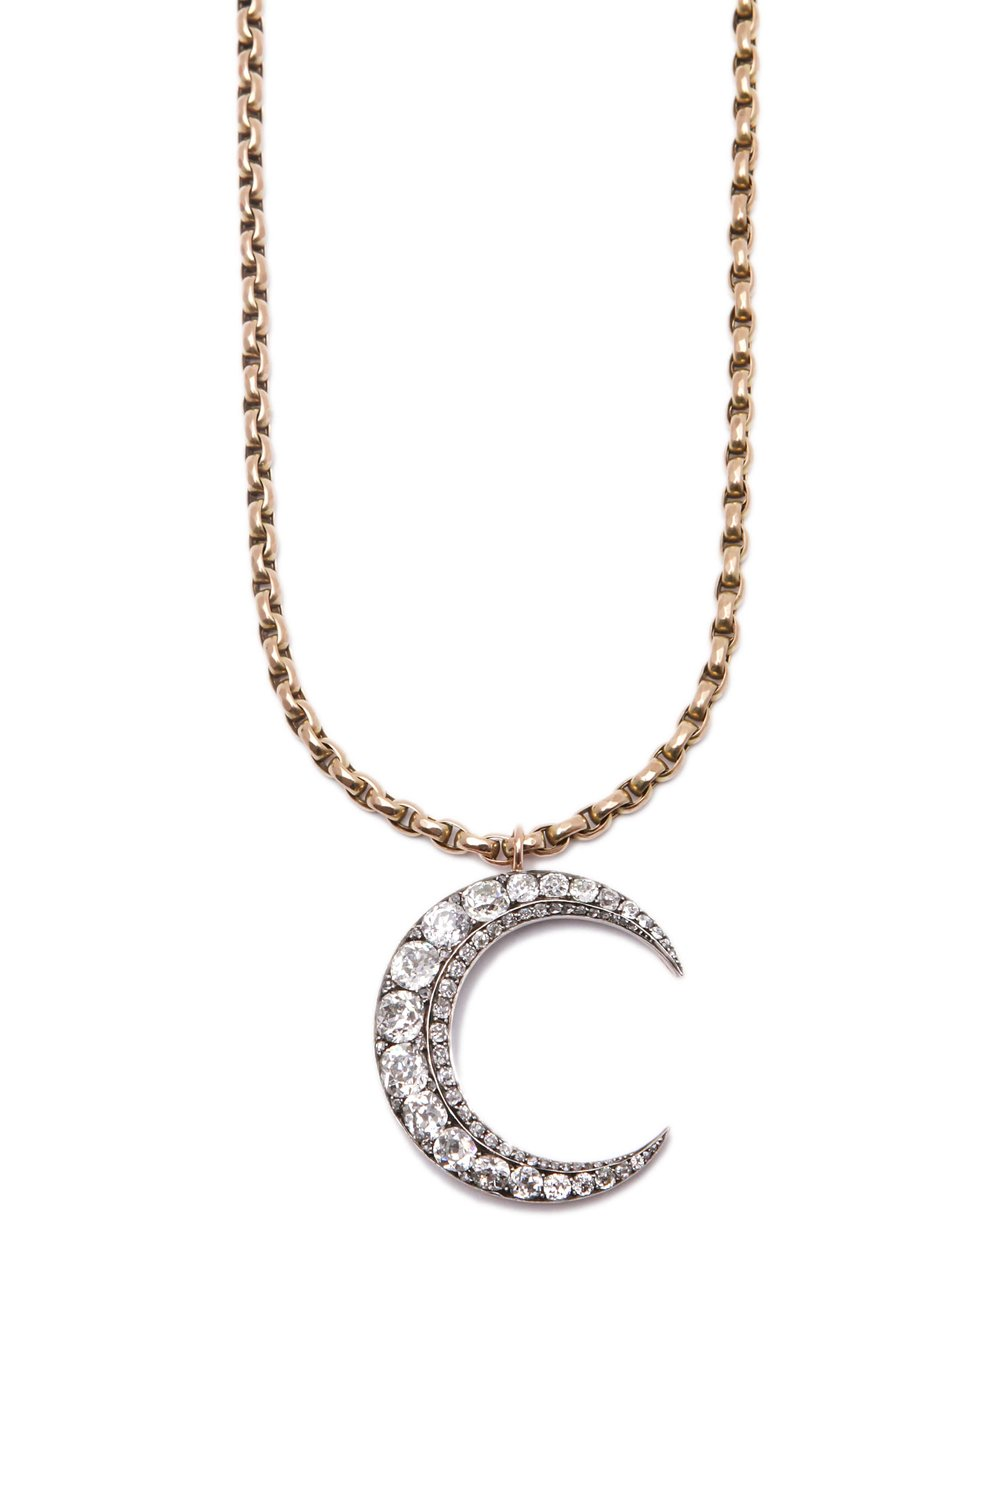 TONI + CHLOË GOUTAL Crescent, Available at TONI + CHLOË GOUTAL